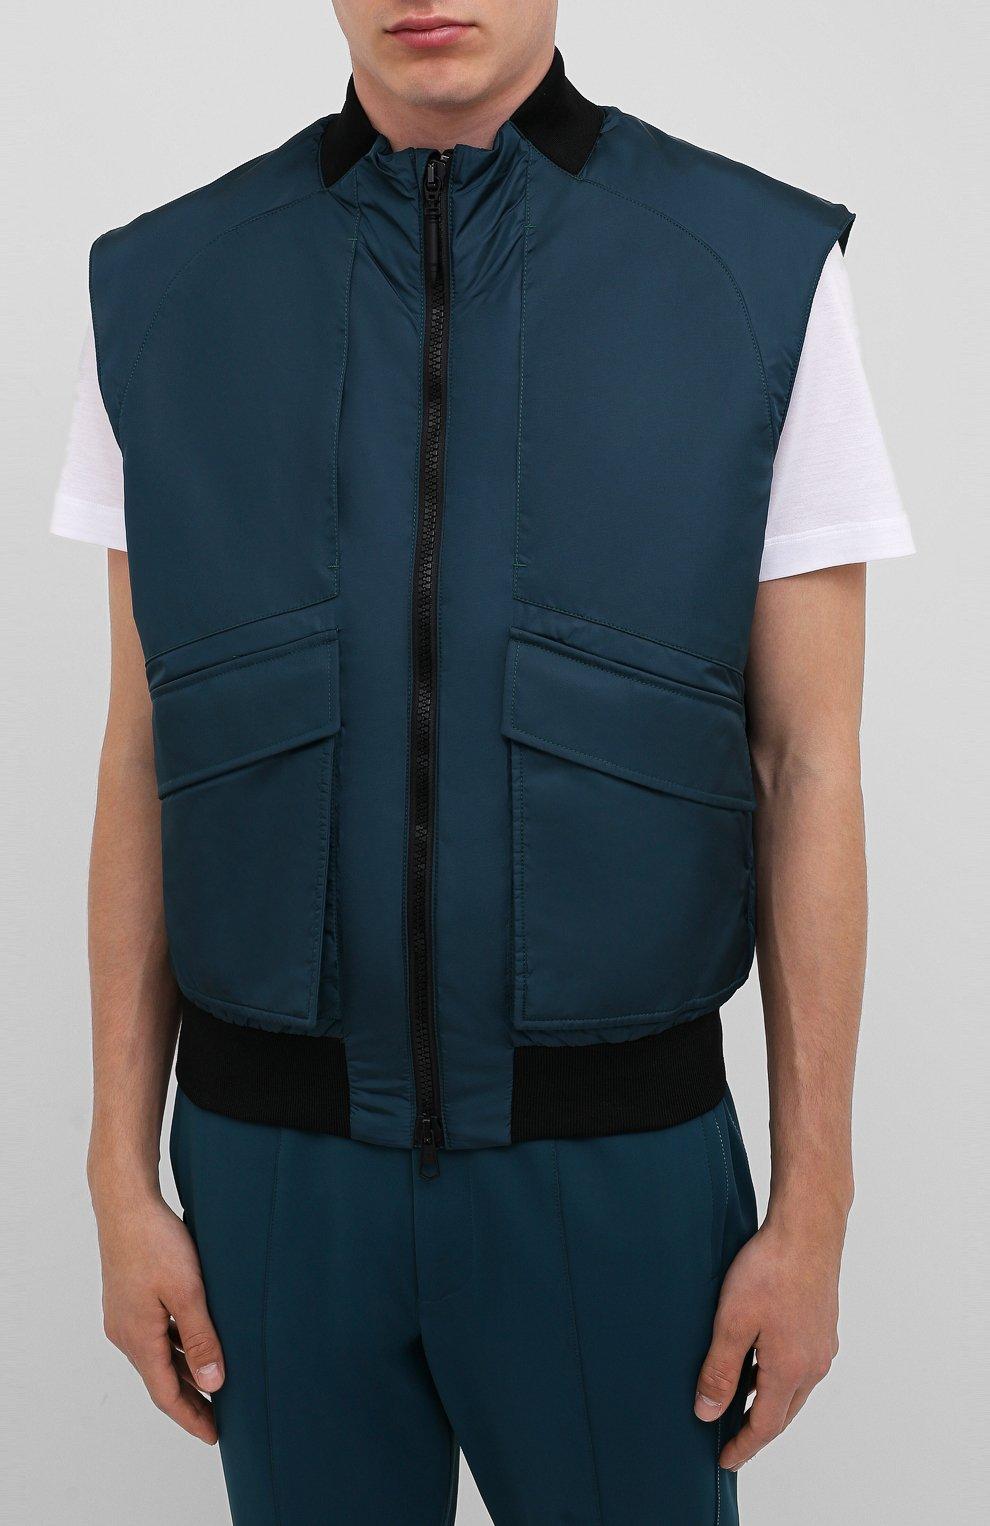 Мужской жилет CROW'S EYE темно-бирюзового цвета, арт. LE 65   Фото 3 (Кросс-КТ: Куртка; Материал внешний: Синтетический материал; Стили: Спорт-шик; Материал подклада: Синтетический материал; Мужское Кросс-КТ: Верхняя одежда; Длина (верхняя одежда): Короткие)